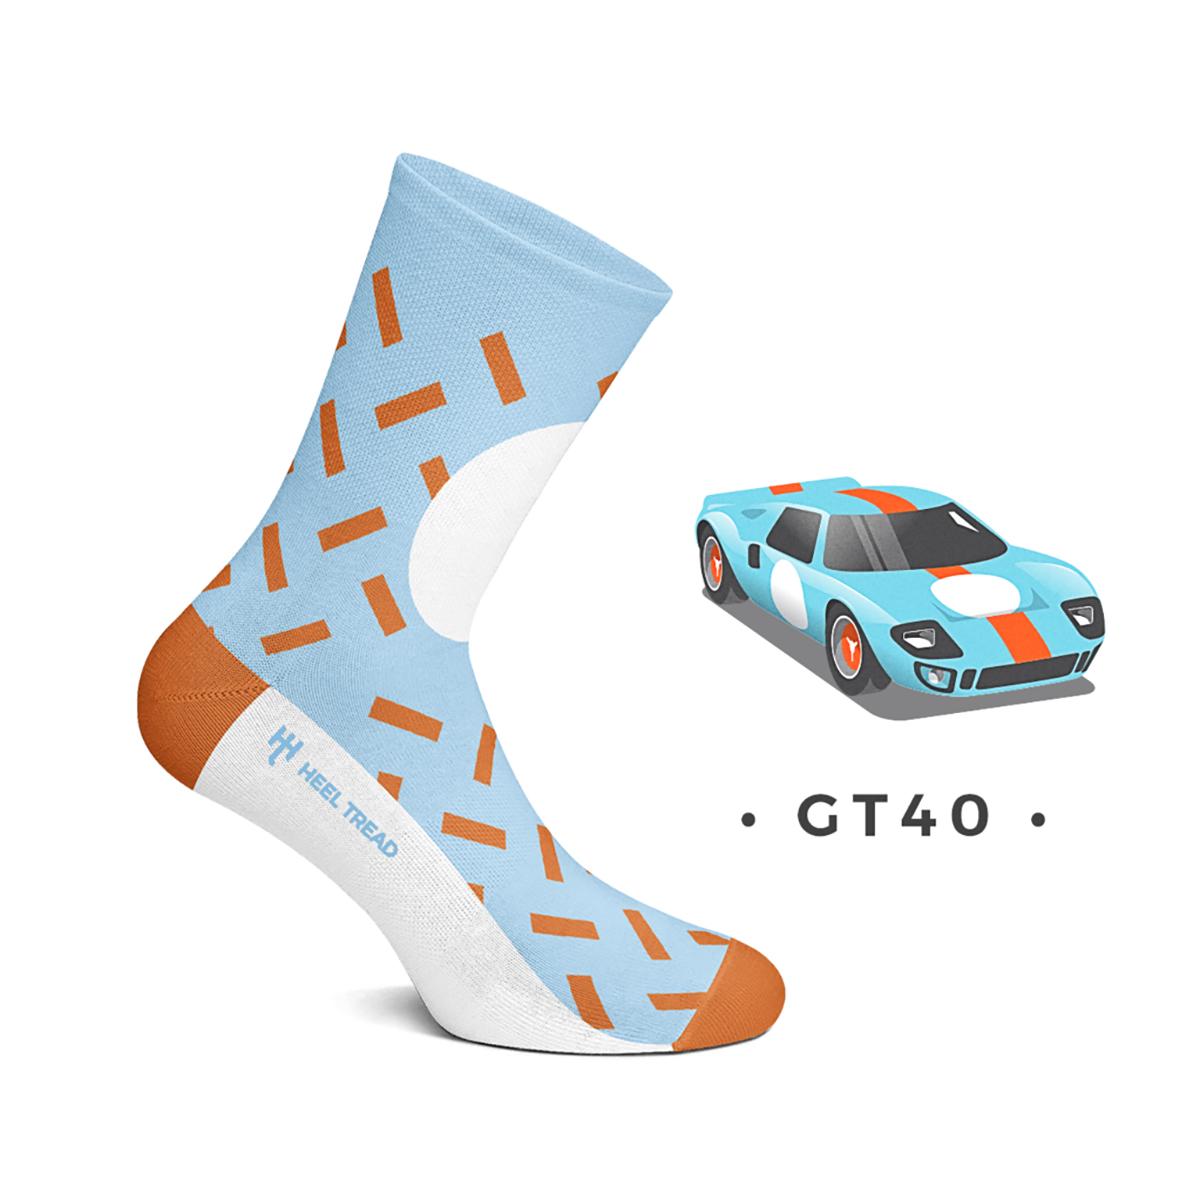 A2_HEEL_TREAD_IndieGogo_Collection_GT40_1024x1024